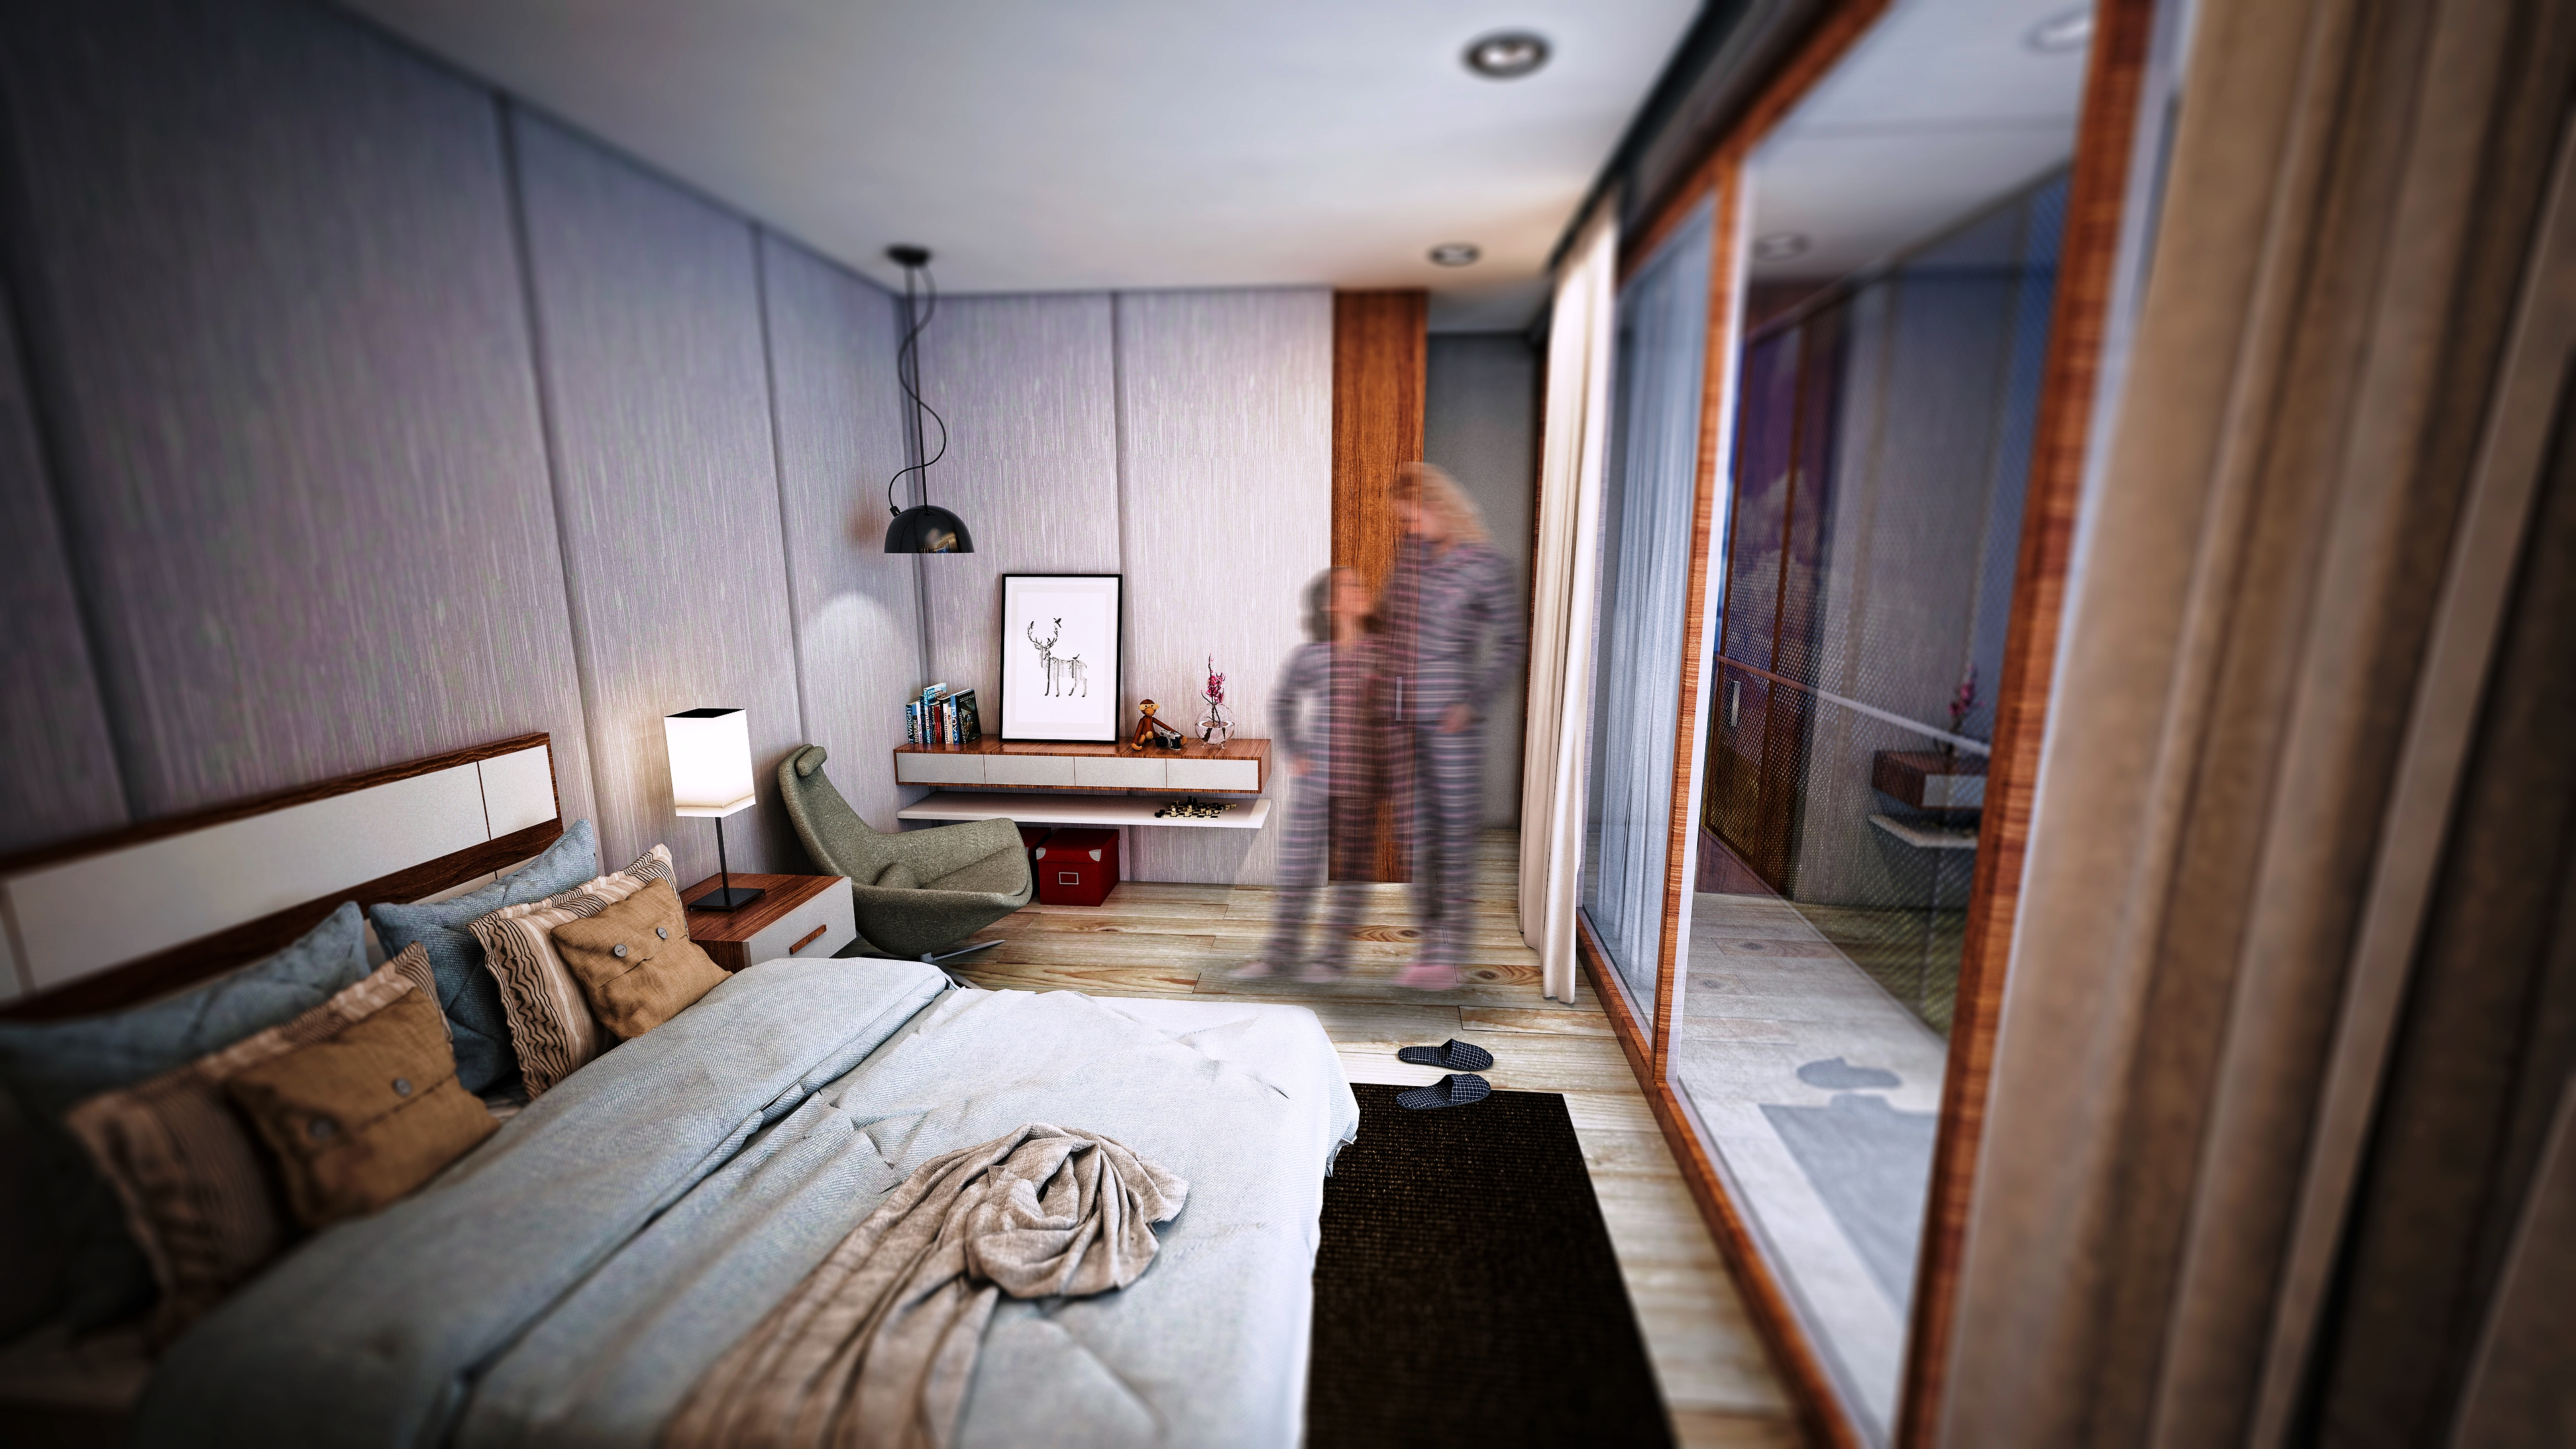 sietequince proyecto viviendas arquitectura passivhaus dormitorio